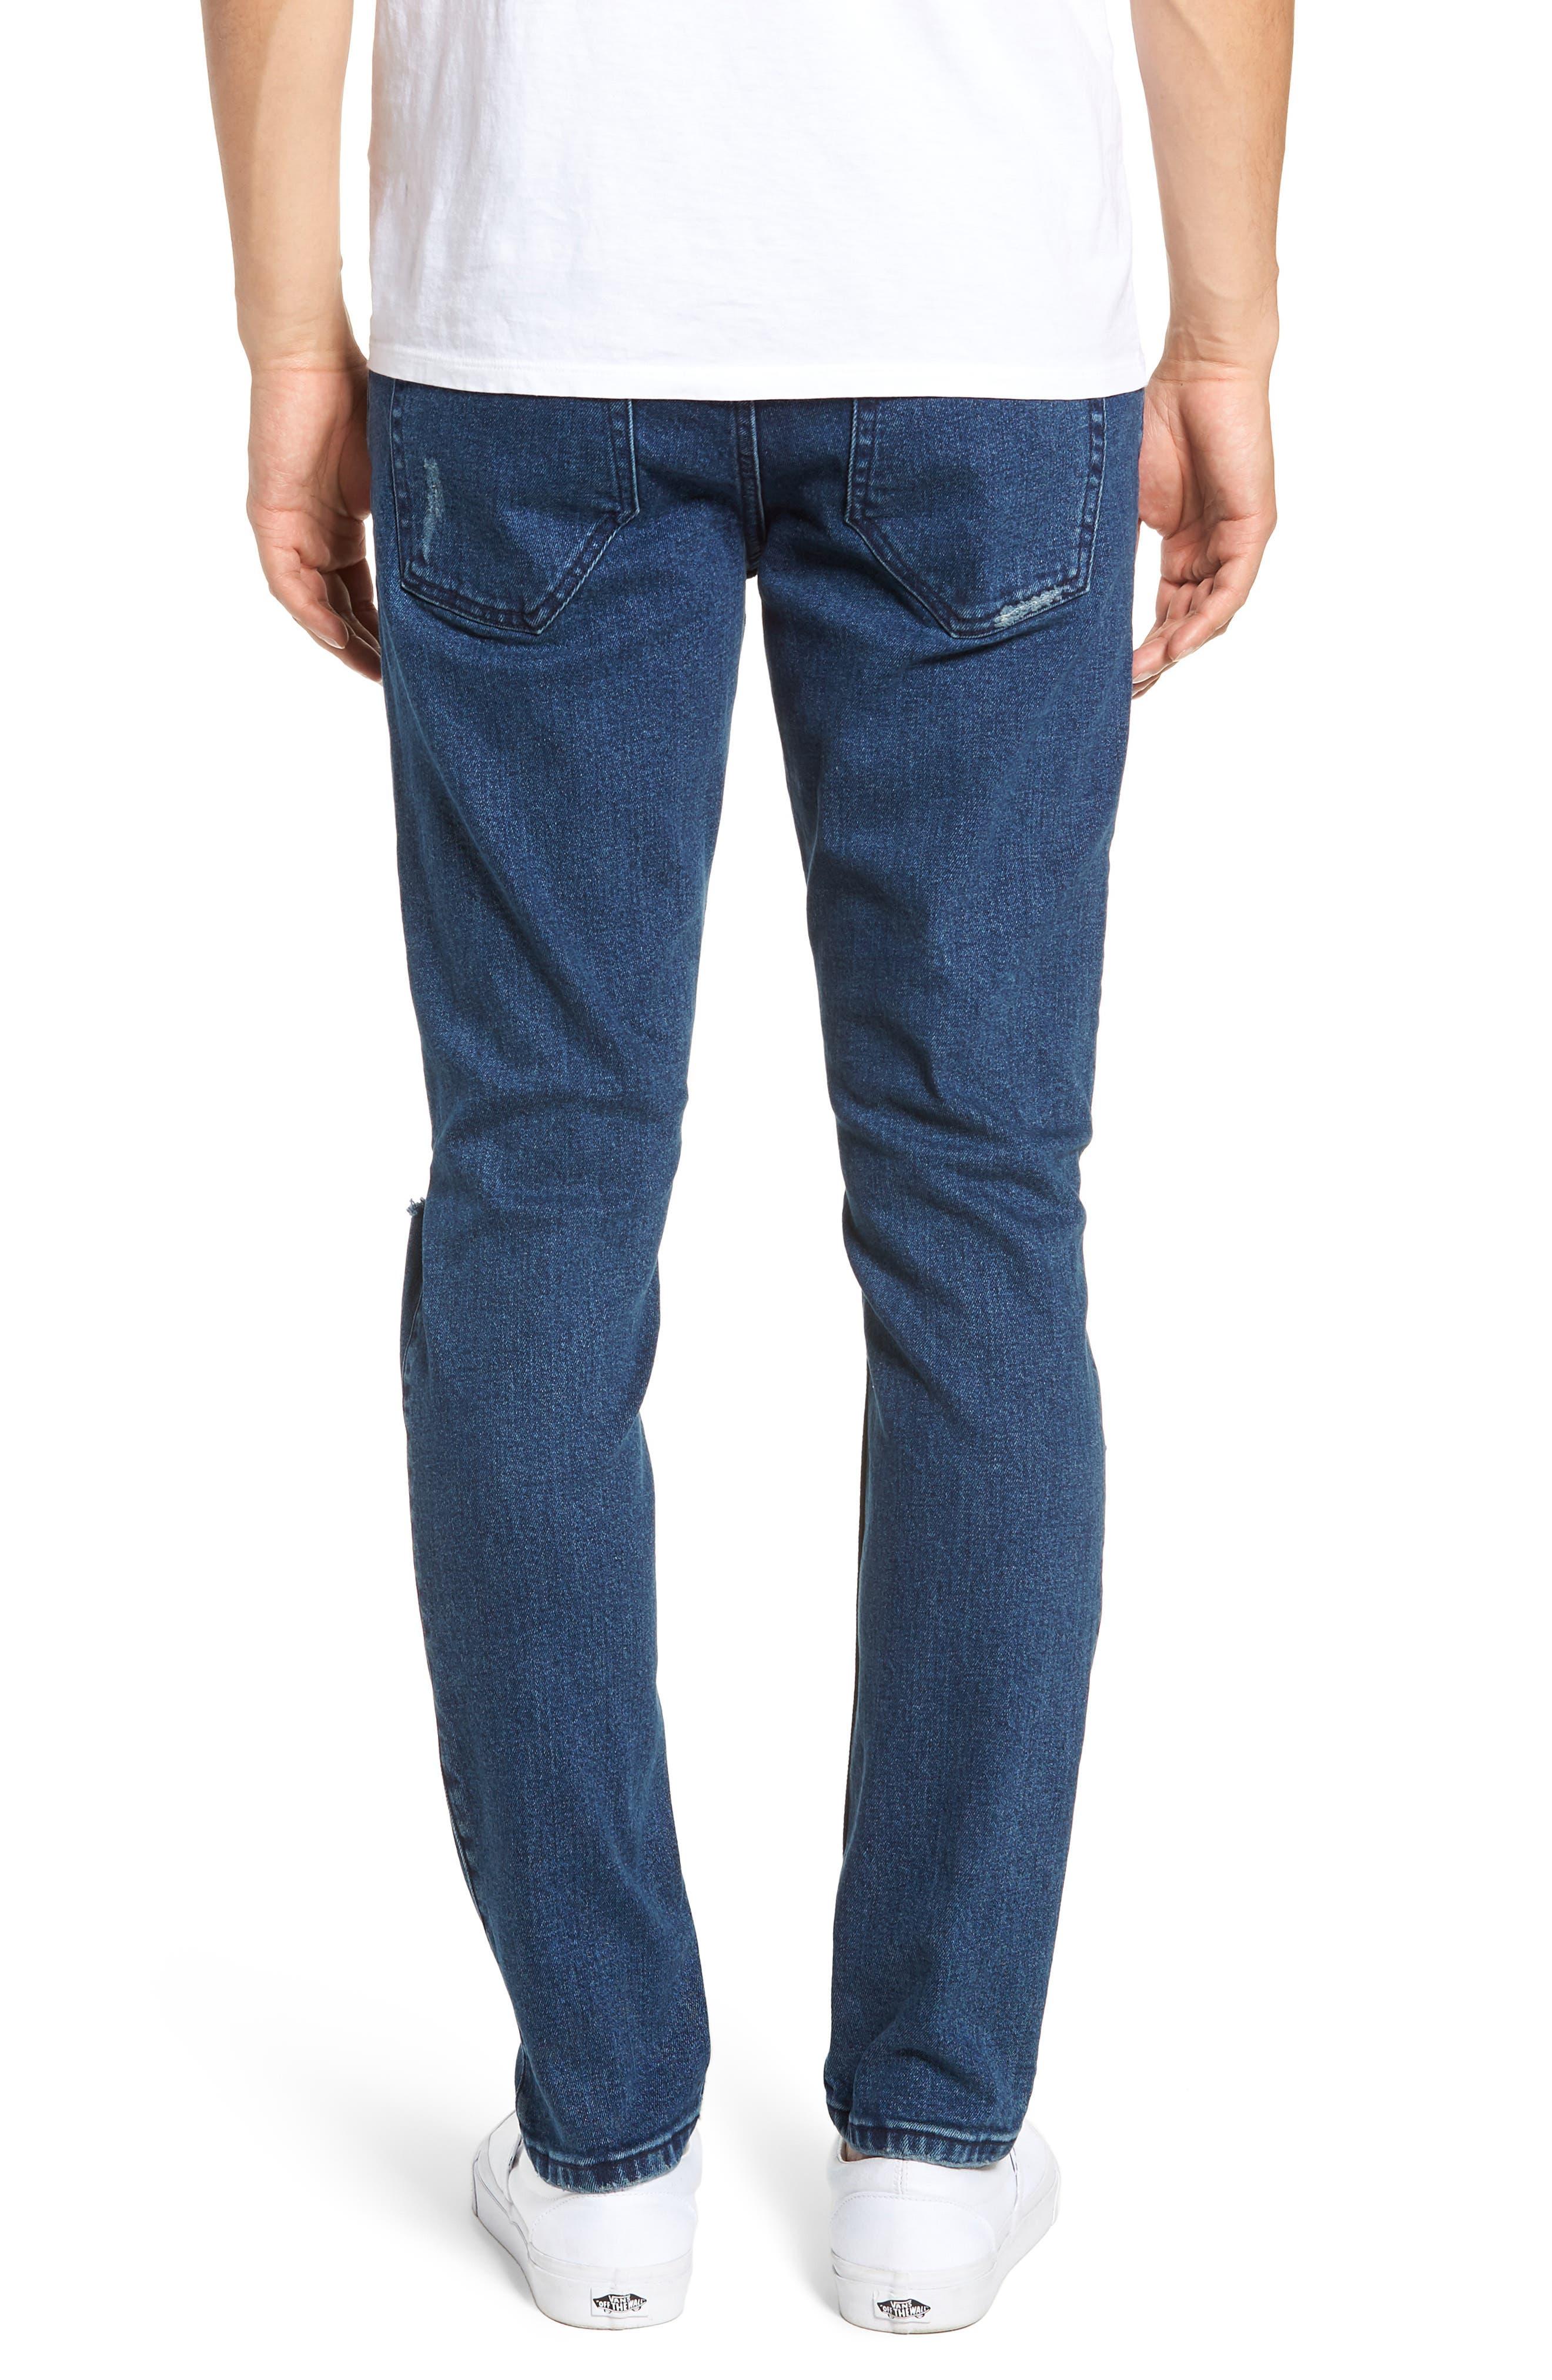 Clark Slim Straight Leg Jeans,                             Alternate thumbnail 2, color,                             WORN ASH BLUE DAMAGED